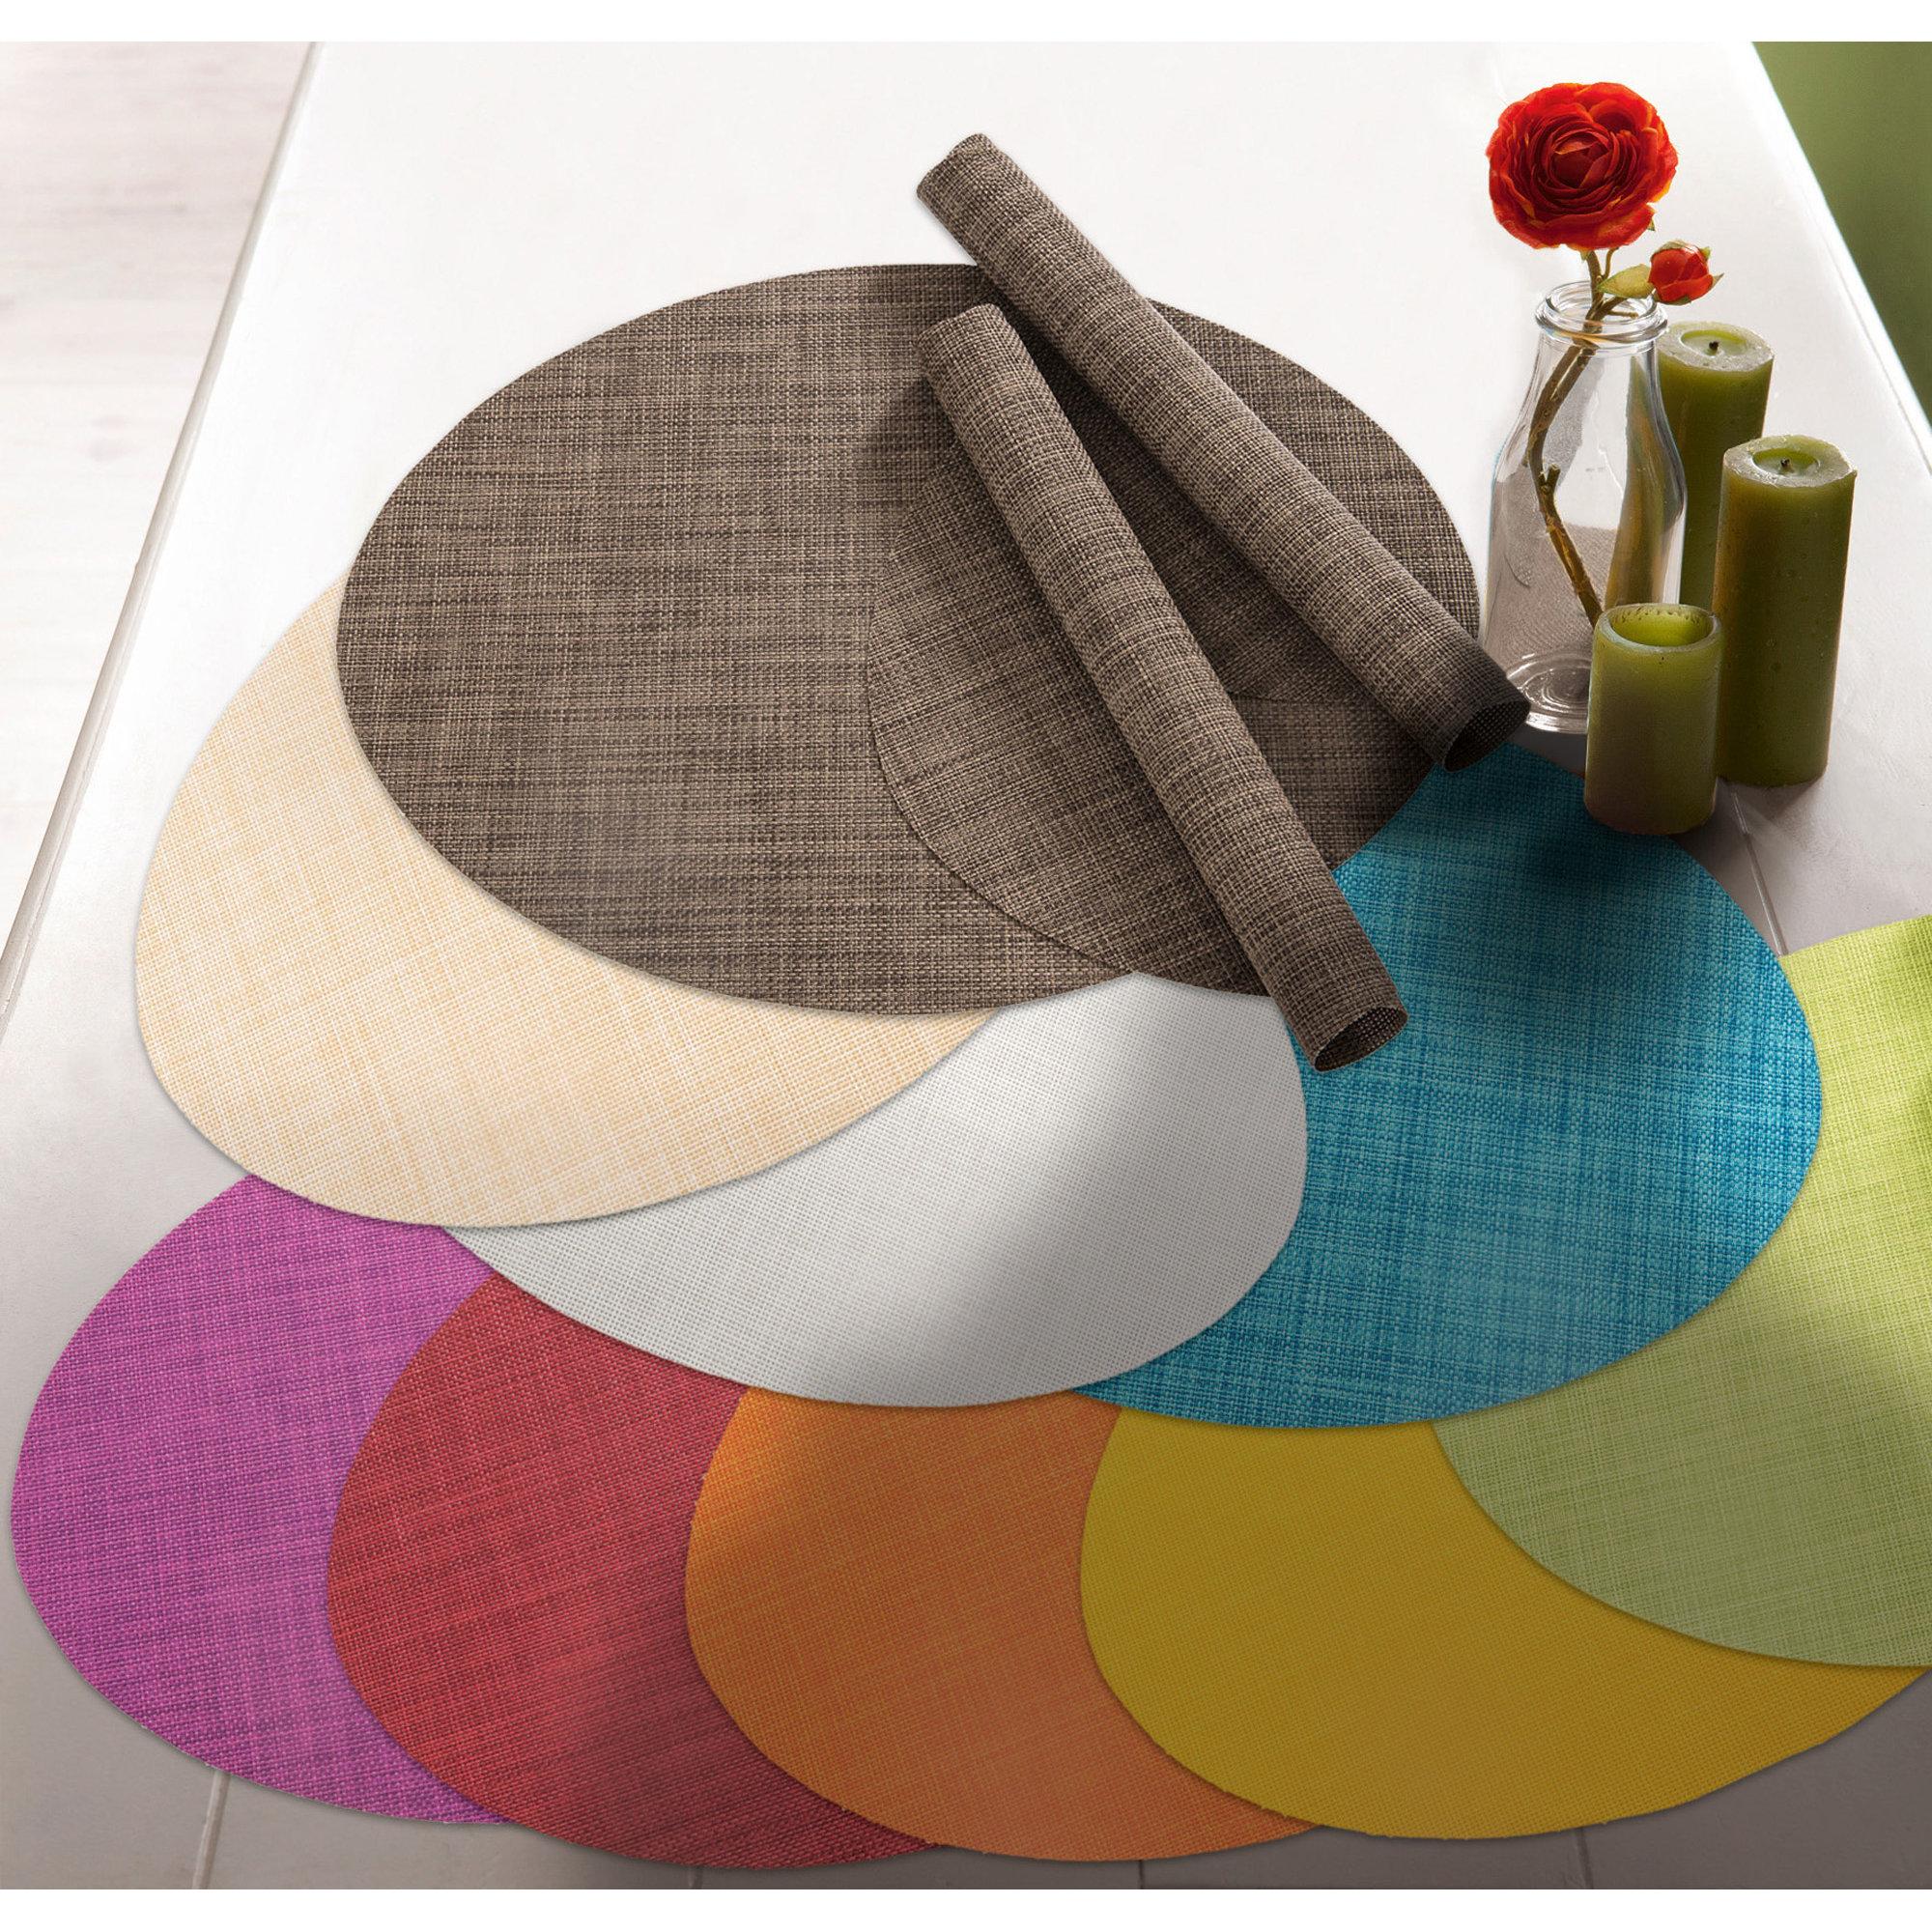 Pichler Tischset oval 2er-Pack